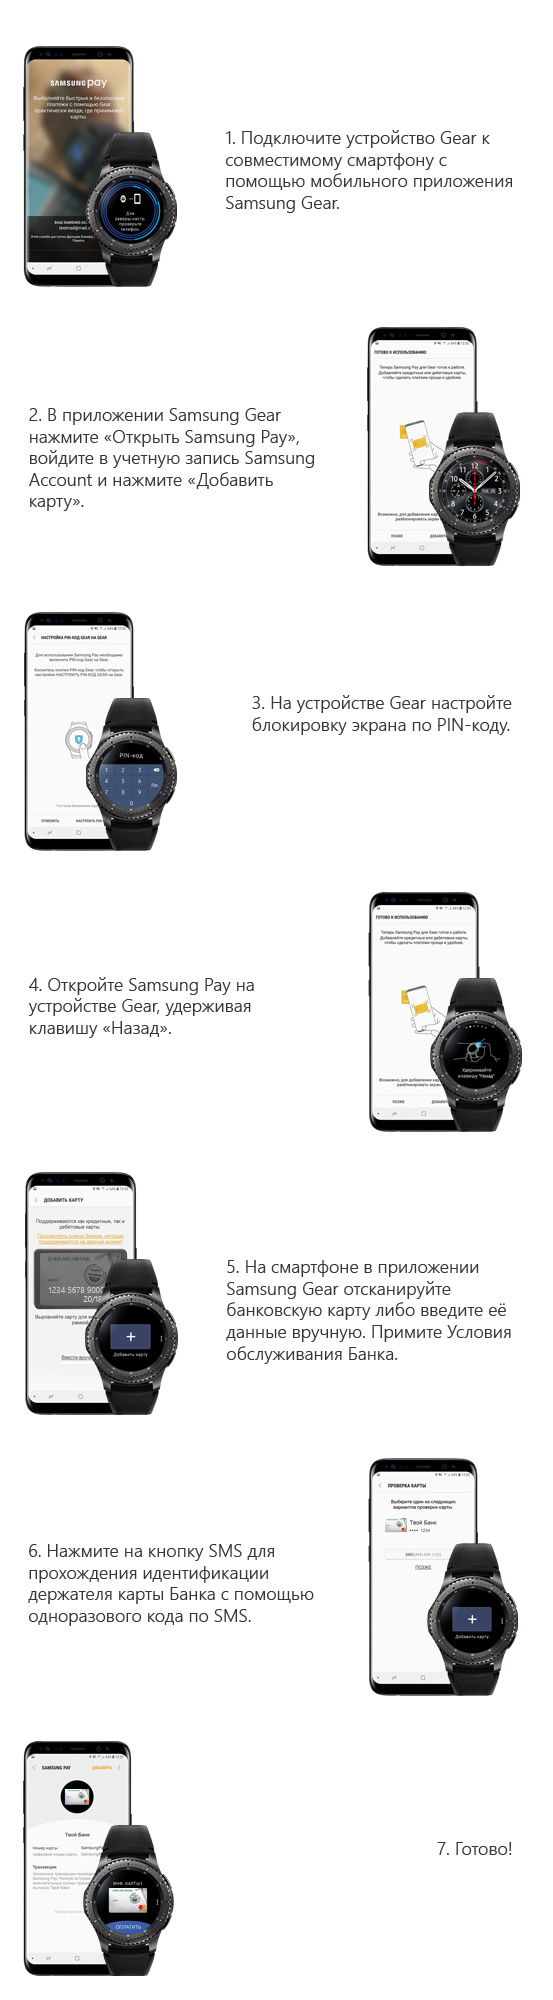 Samsung Pay на Gear S3